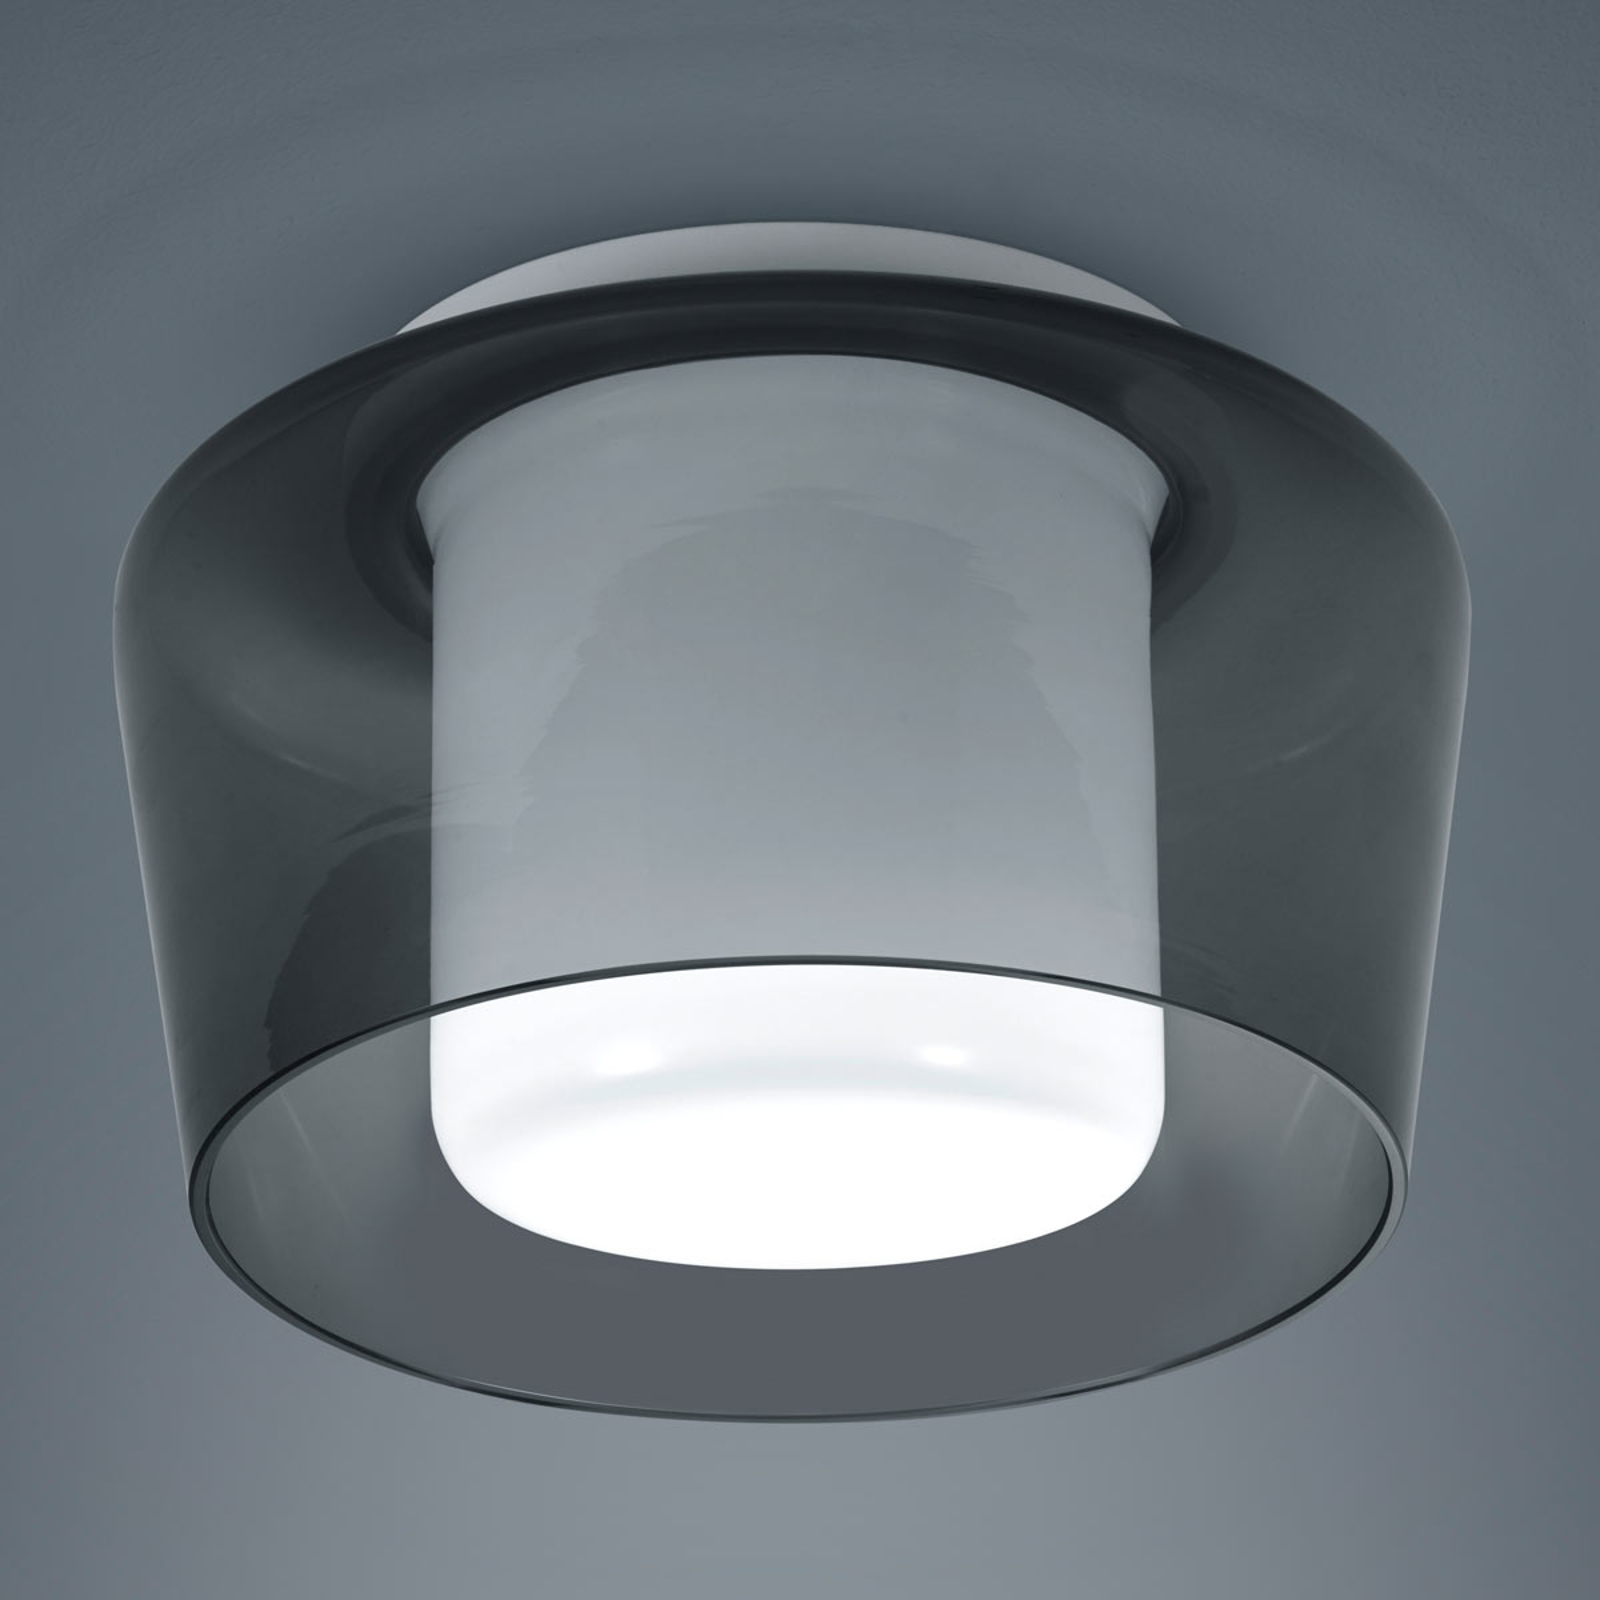 Helestra Canio – taklampe i glass, røykgrå